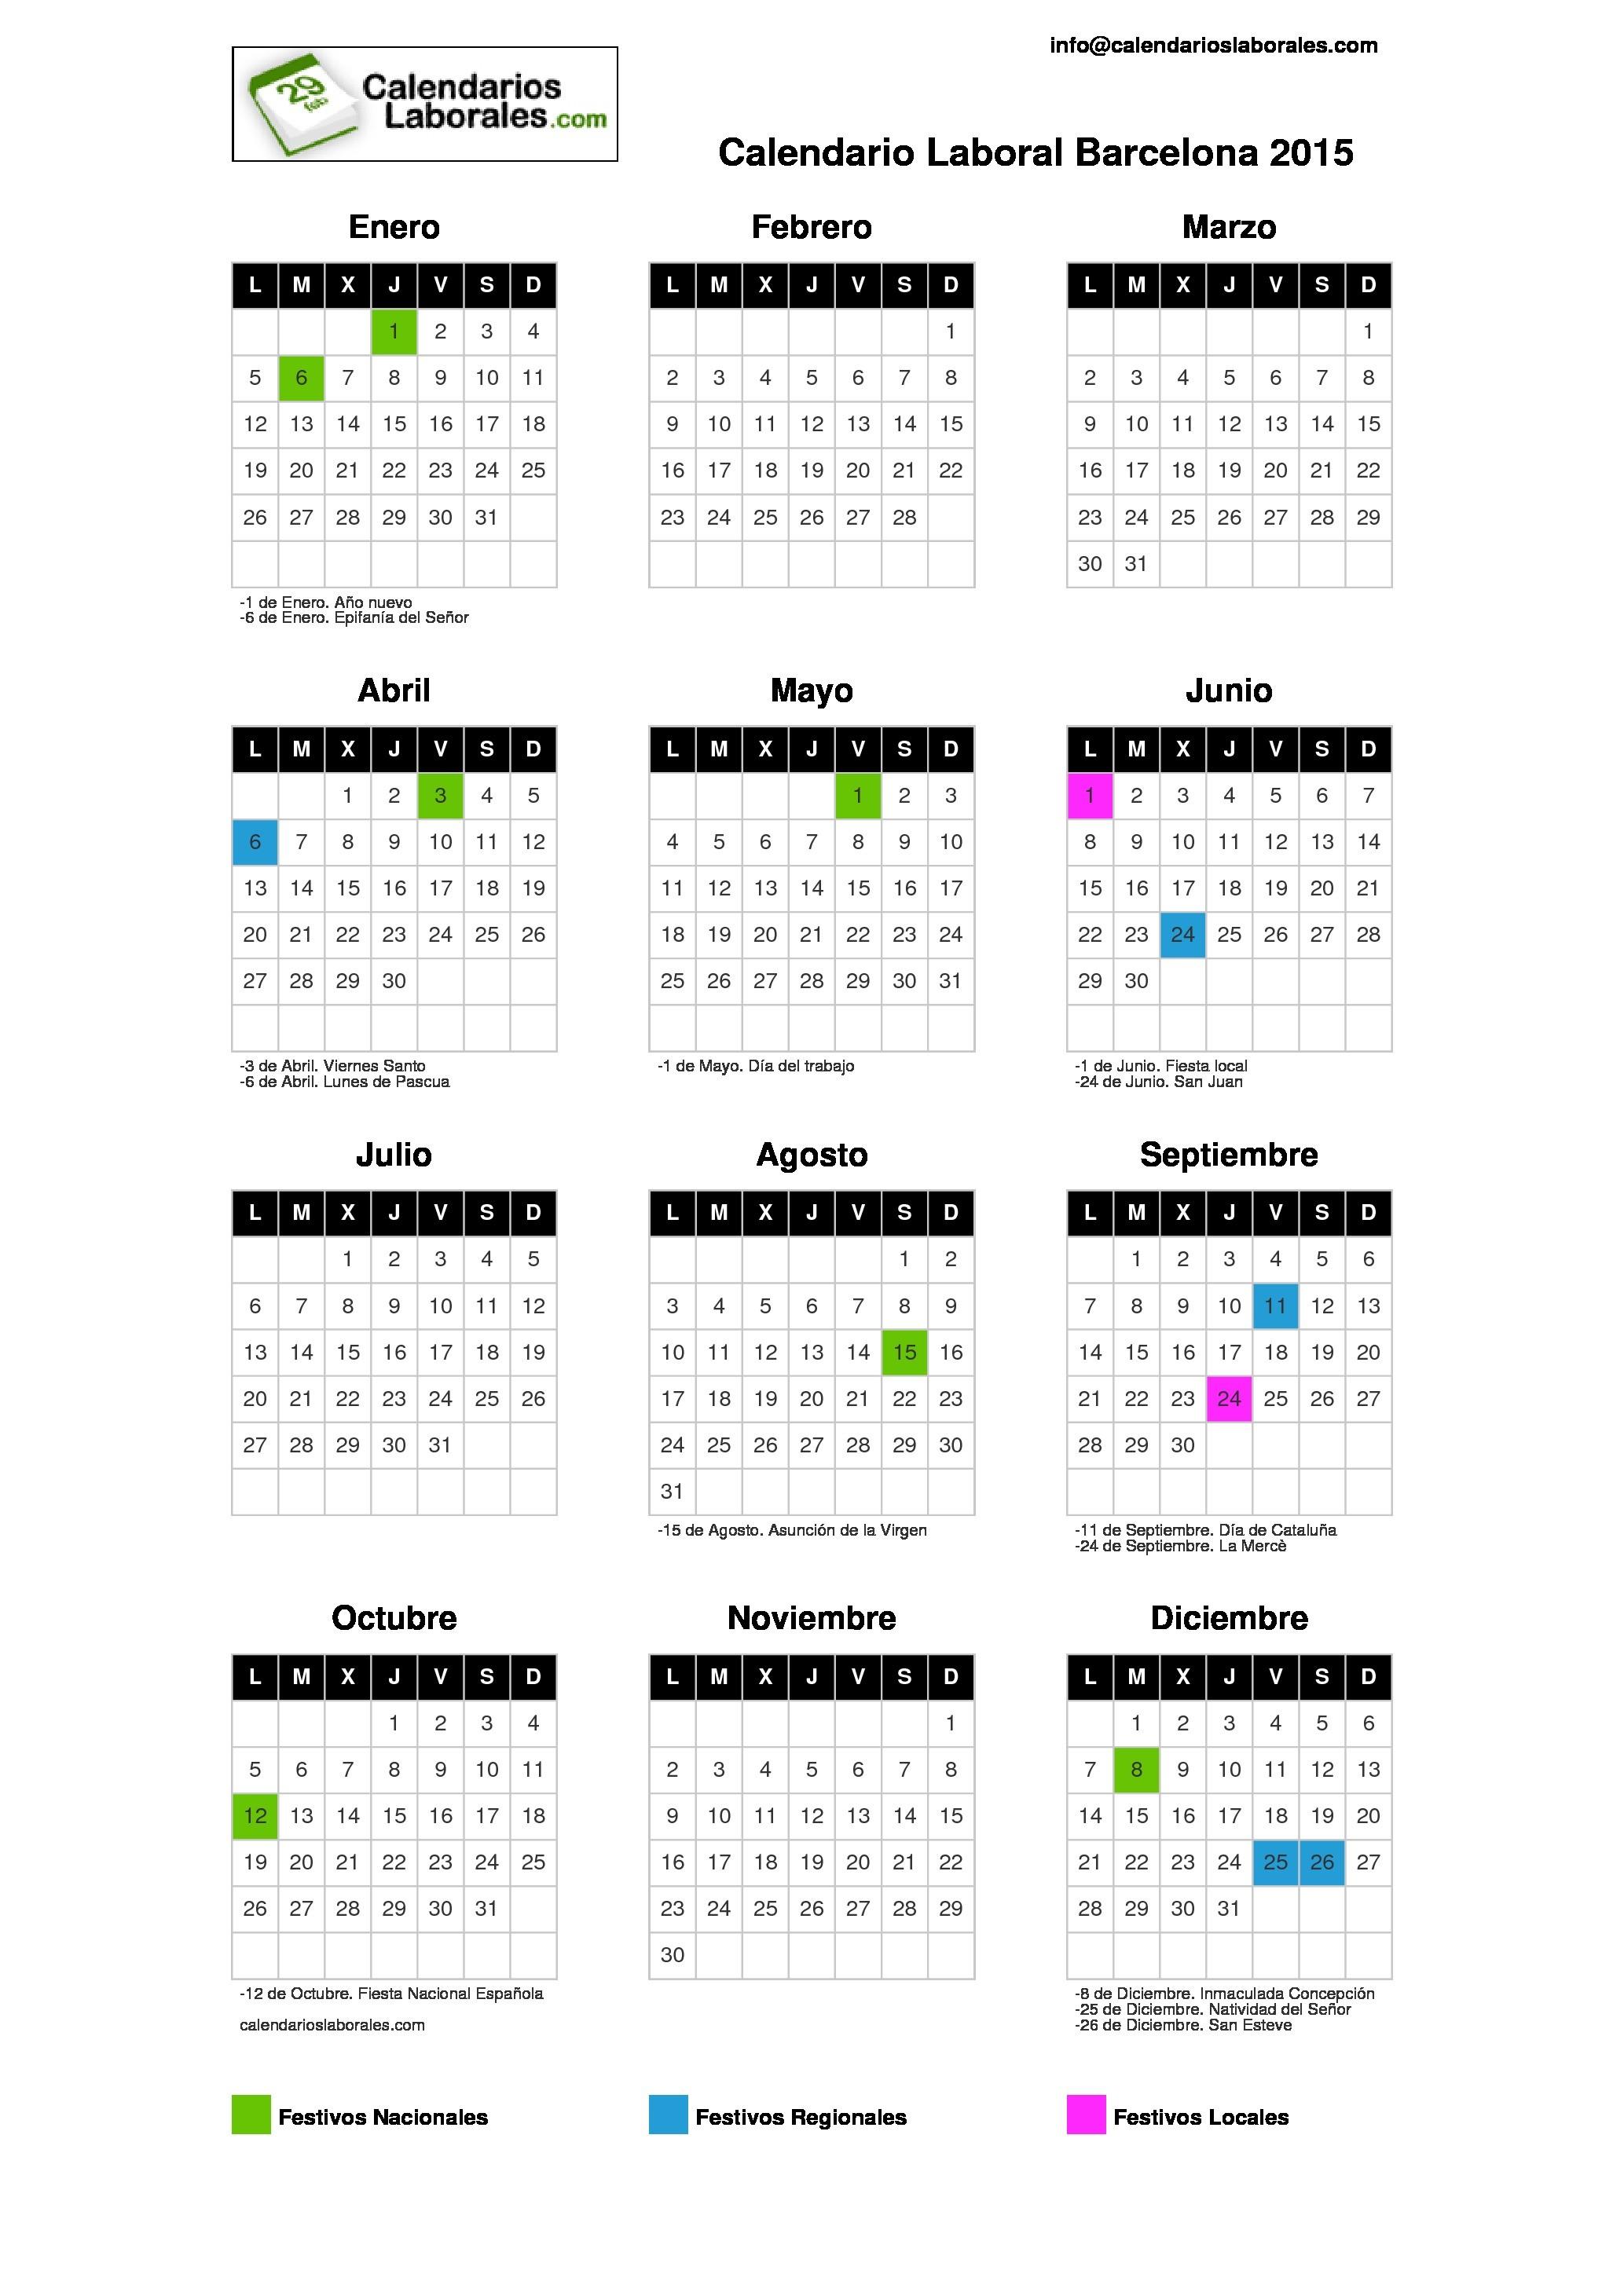 calendario laboral barcelona 2015